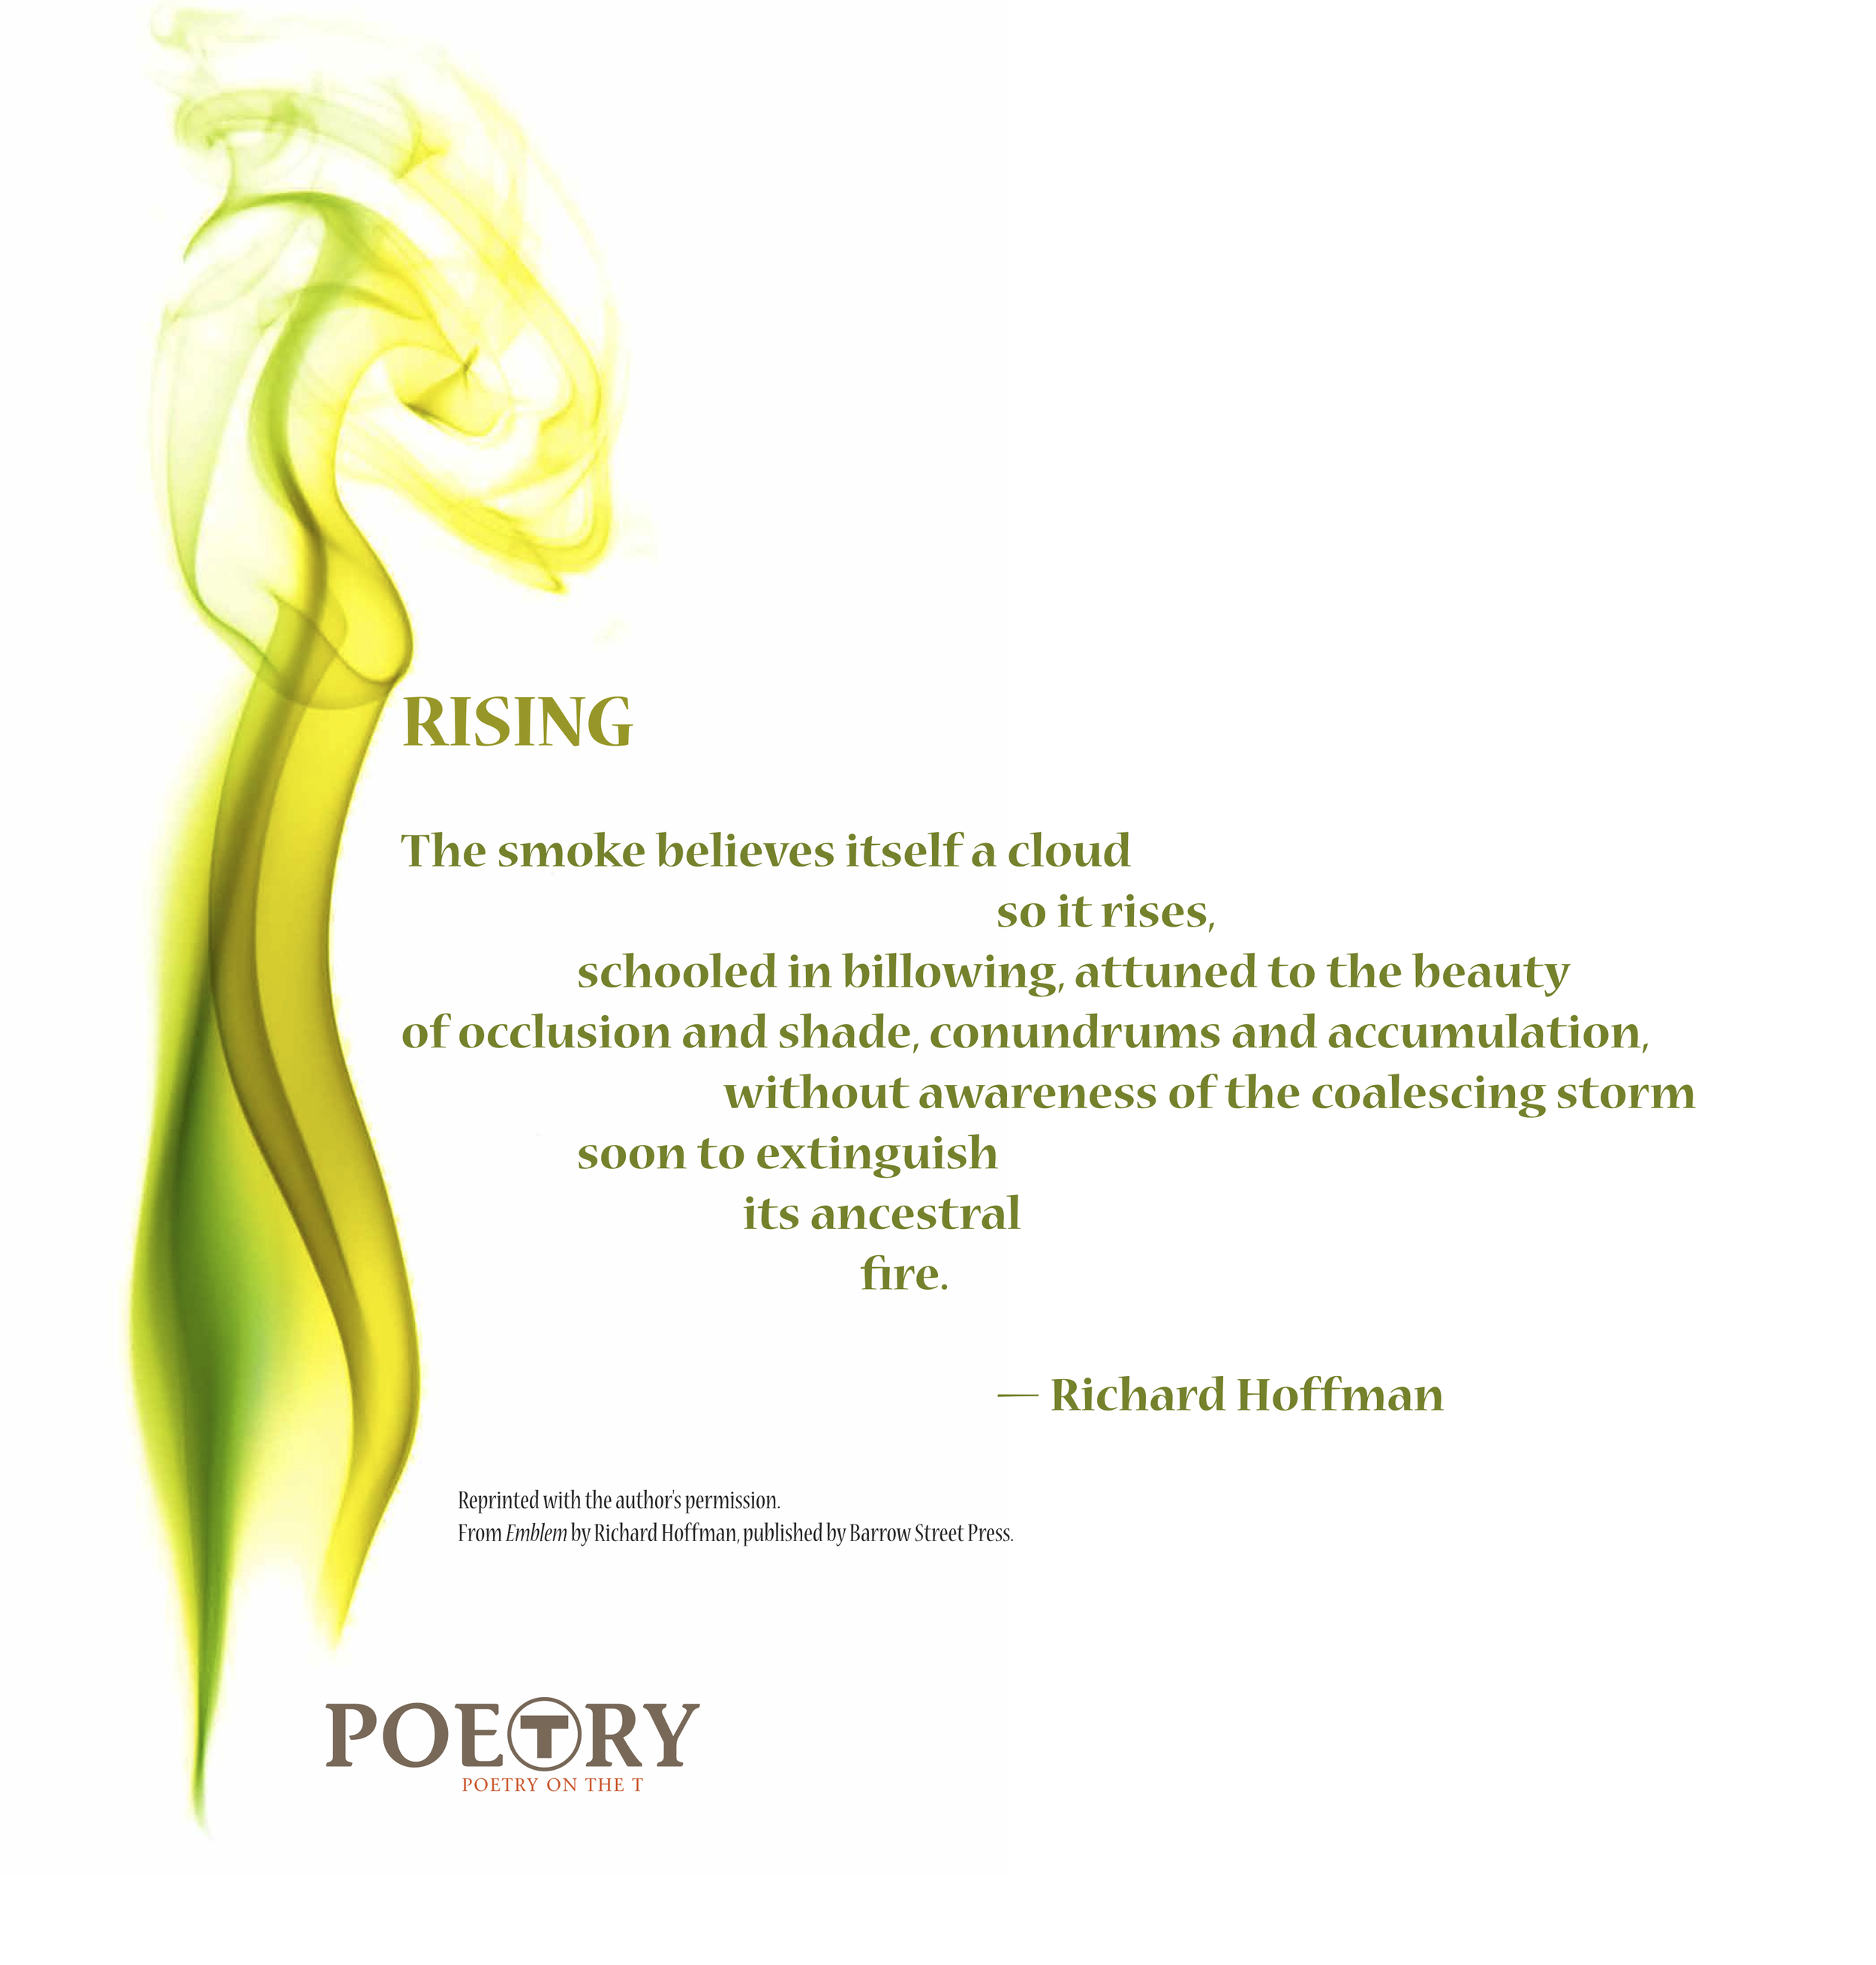 MassPoetry-T-PoemsAUG14-04-RISING-notear.jpg